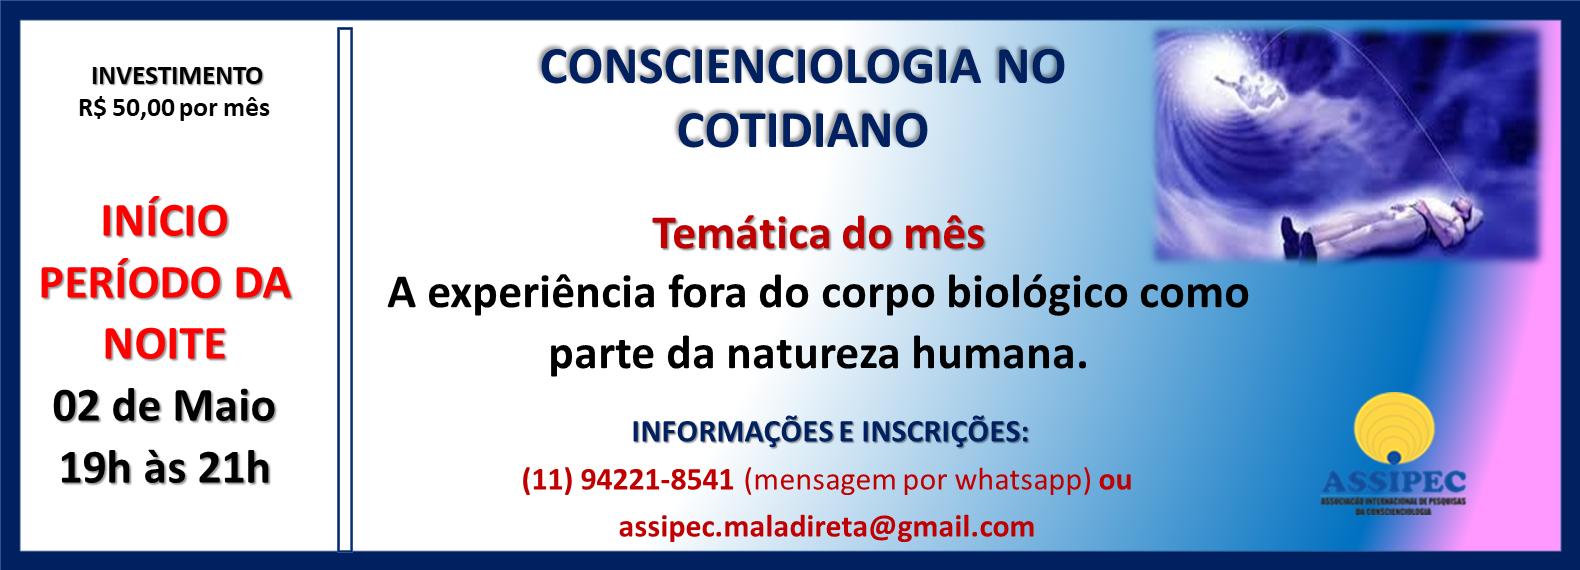 site CCIOLOGIA COTIDIANO MAIO NOITE